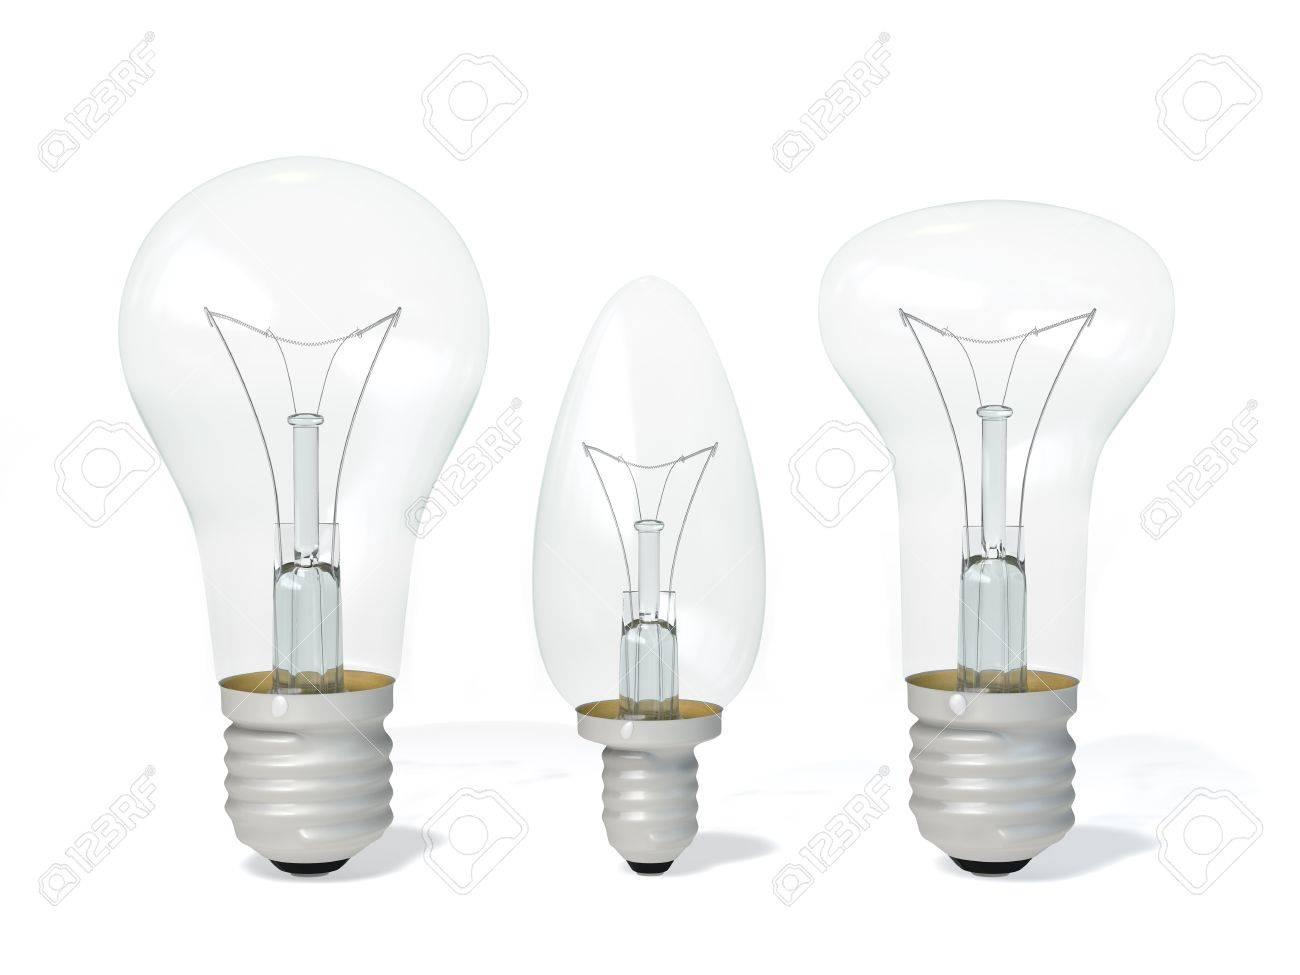 Le lampade ad incandescenza è su uno sfondo bianco foto royalty